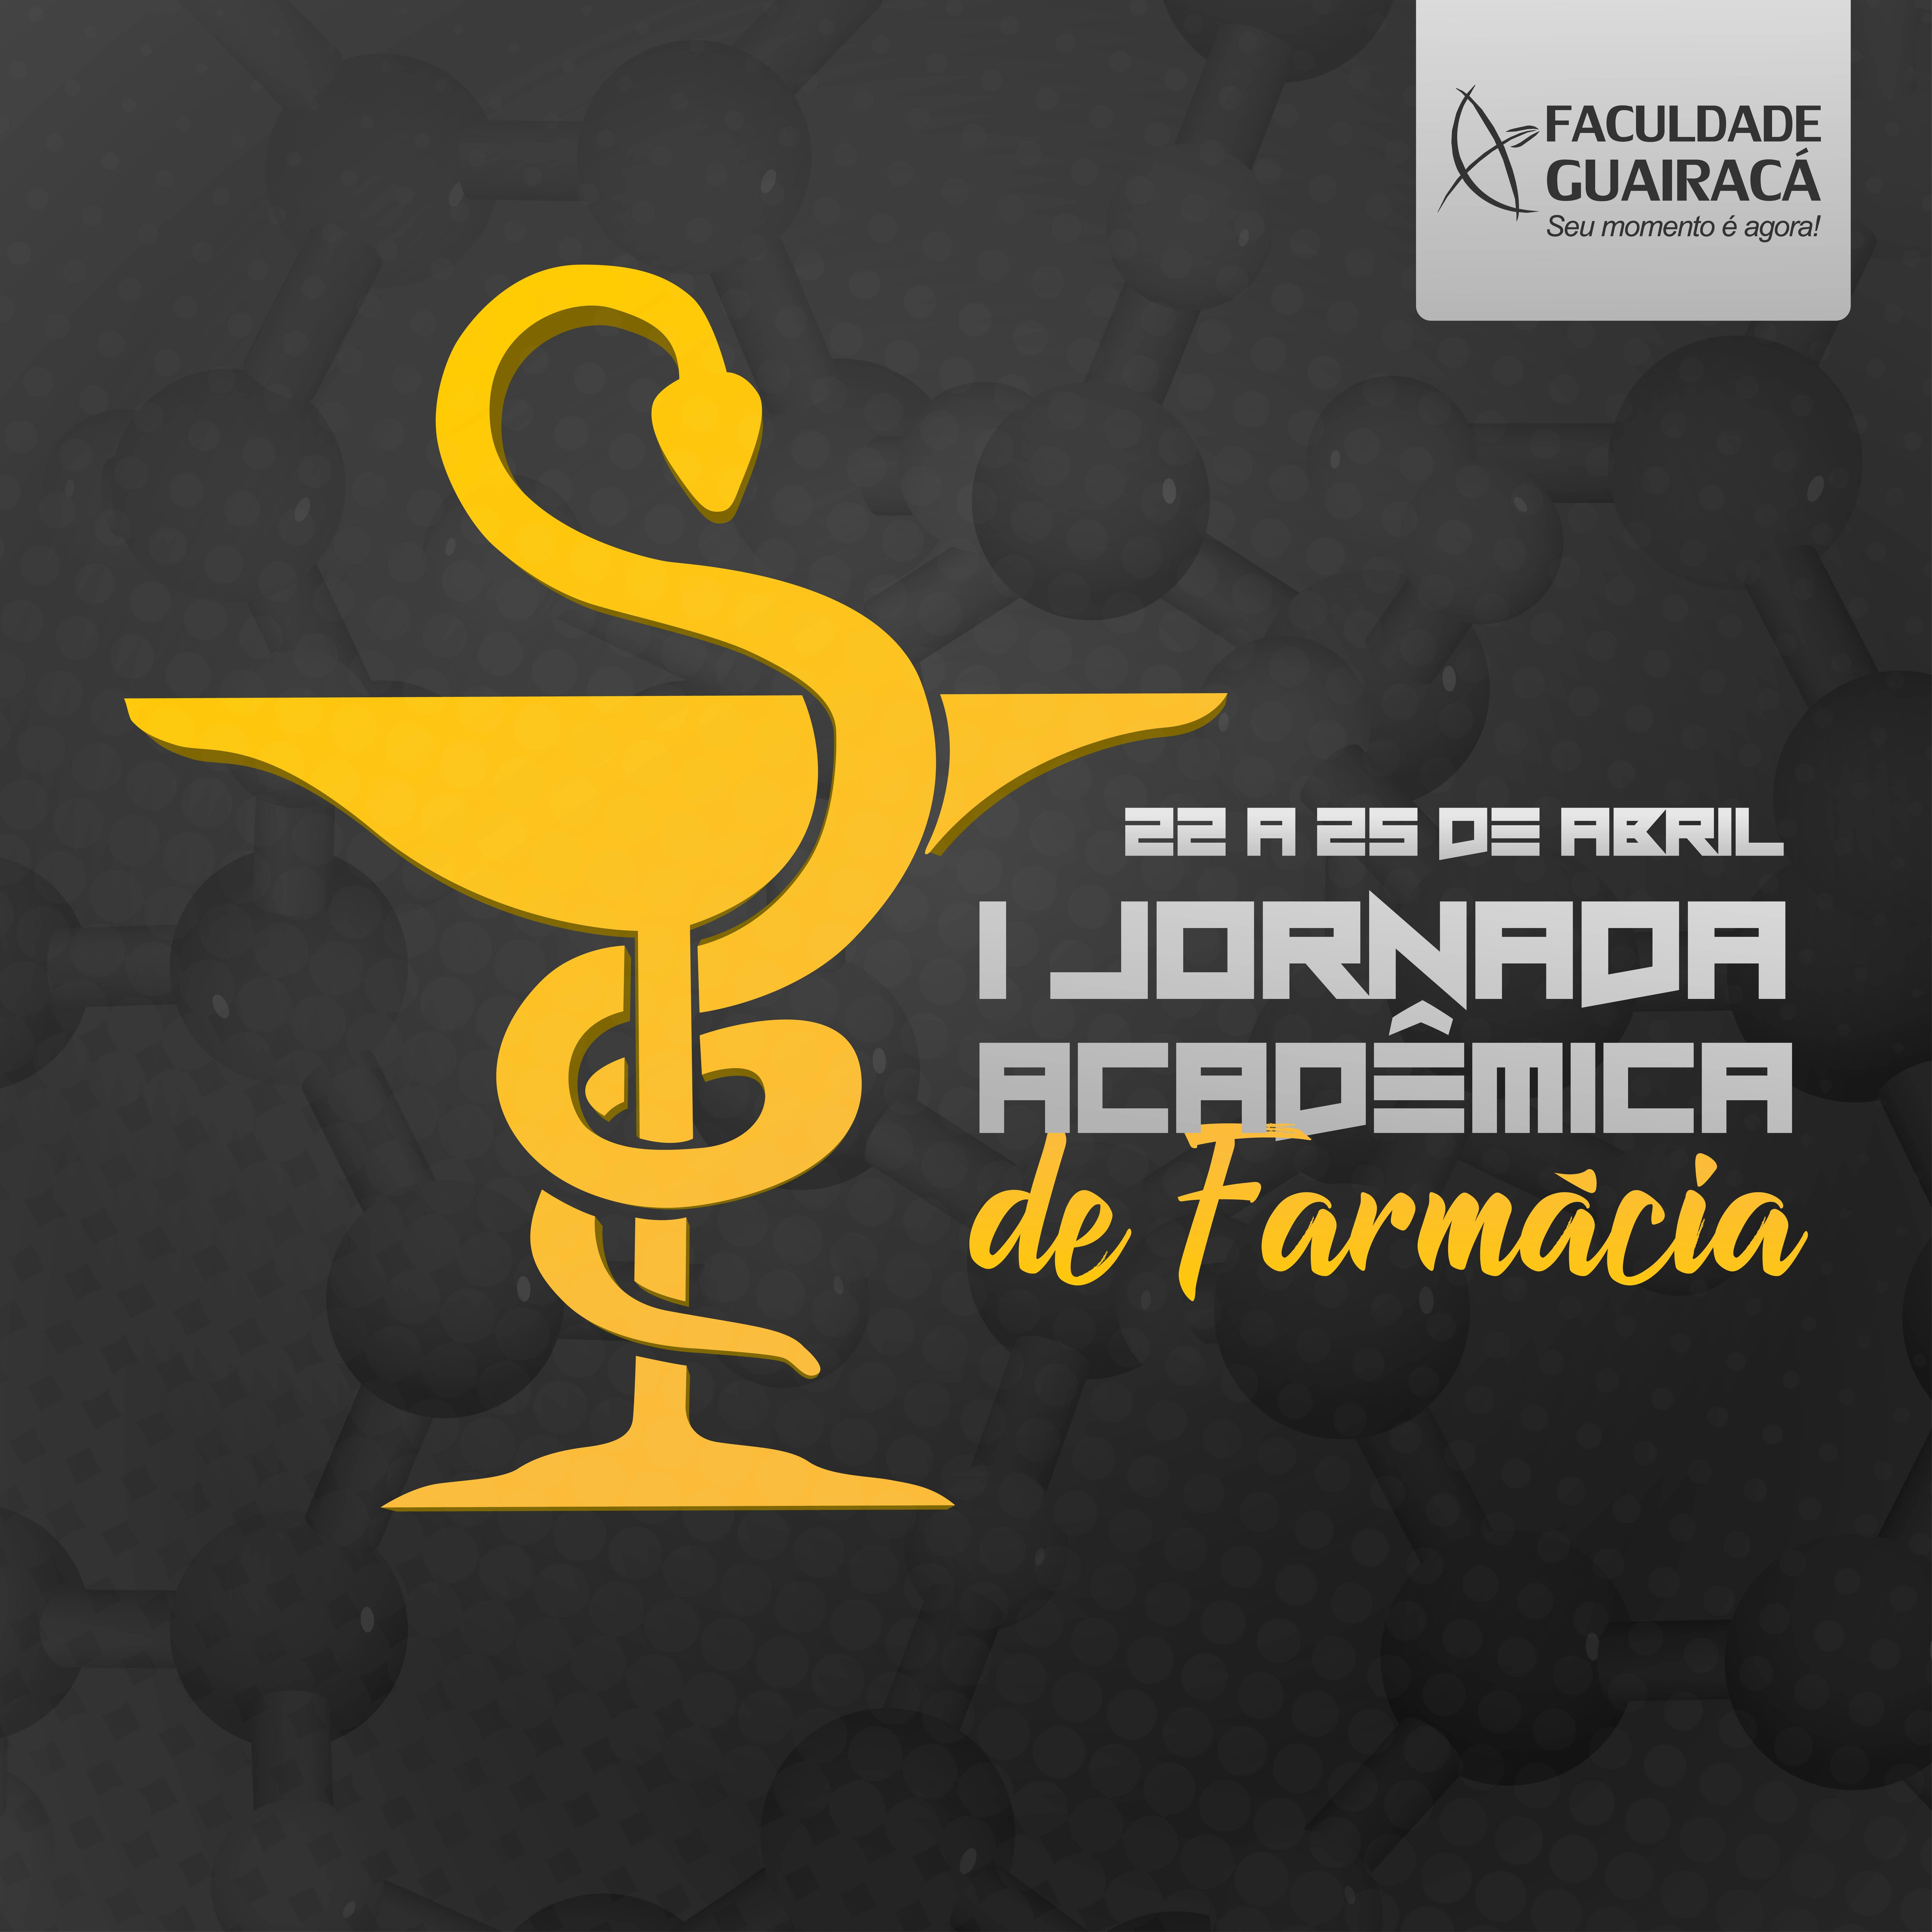 Faculdade Guairacá promove I Jornada Acadêmica de Farmácia